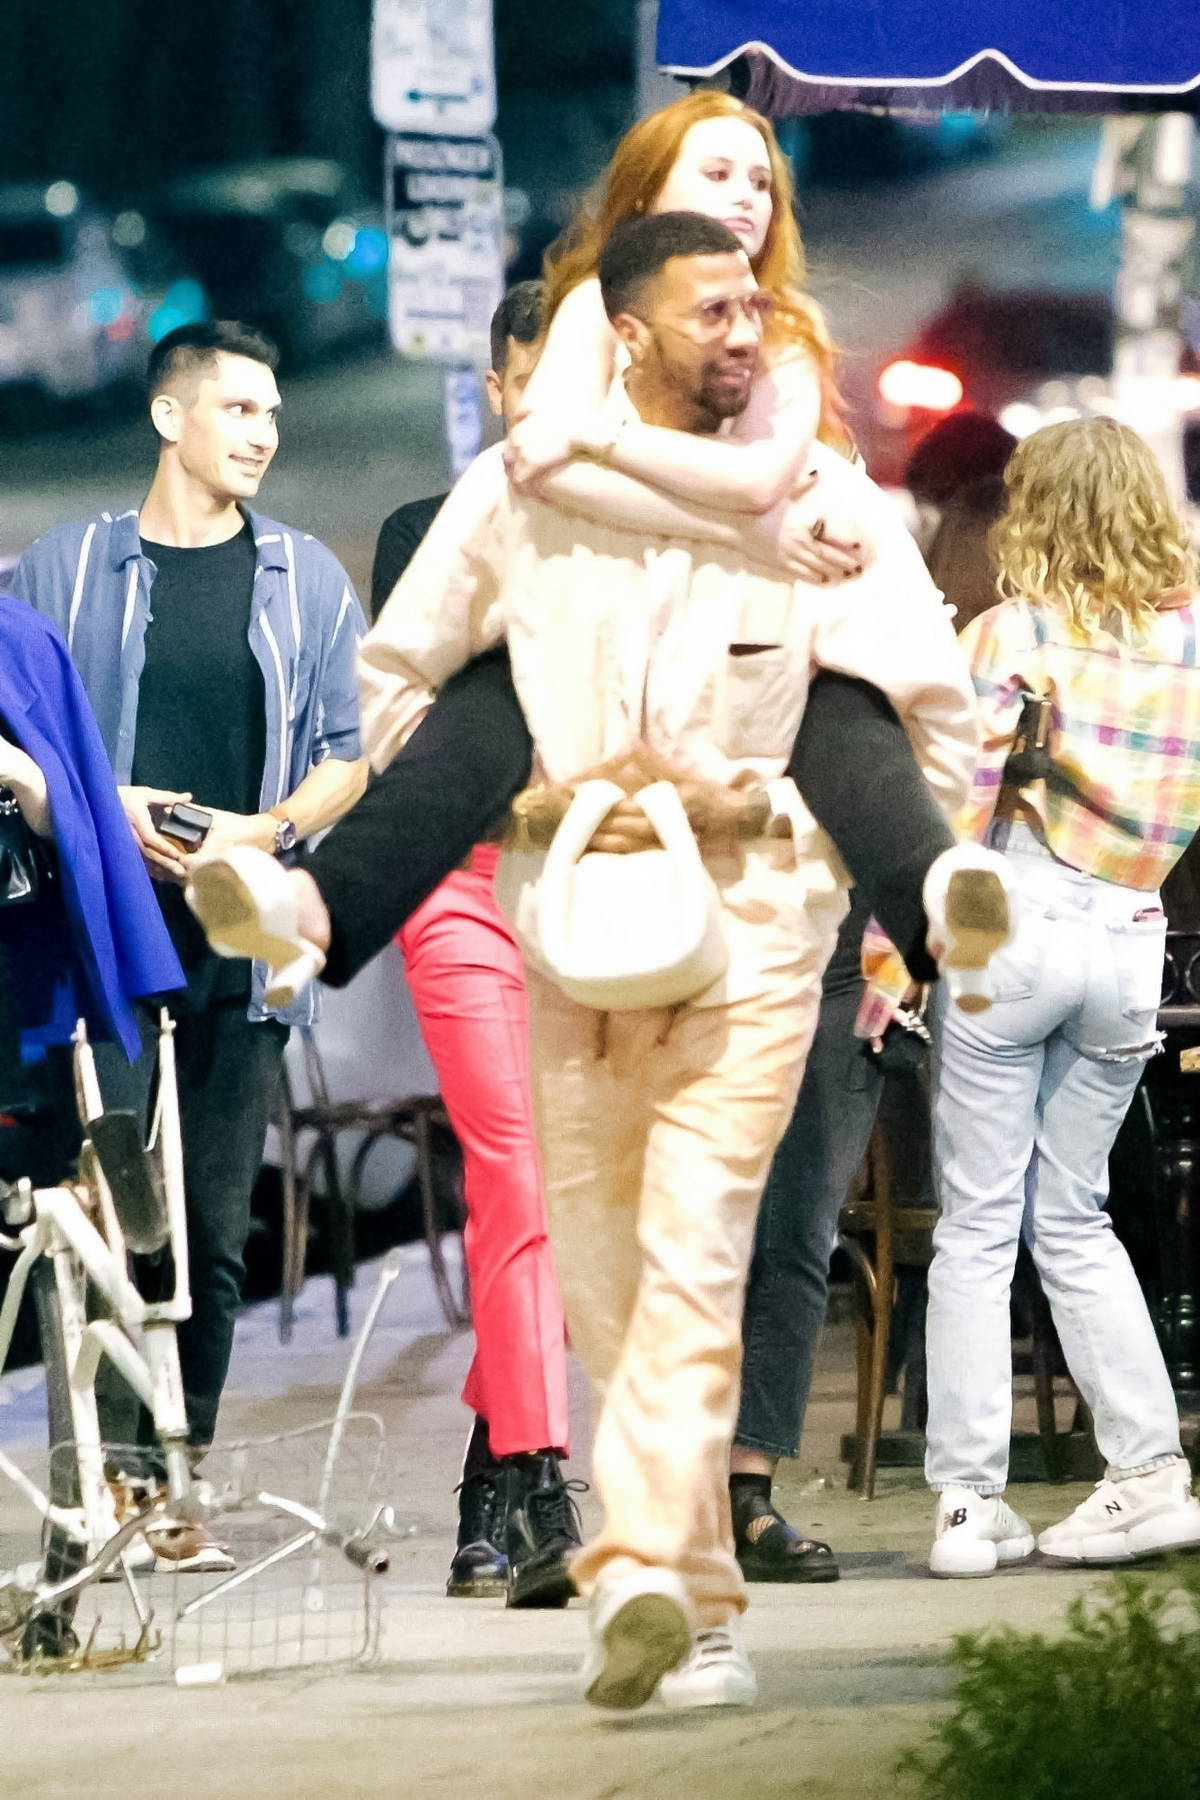 Madelaine Petsch gets a piggyback ride on her boyfriend Miles Chamley-Watson during a date night in Los Feliz, California